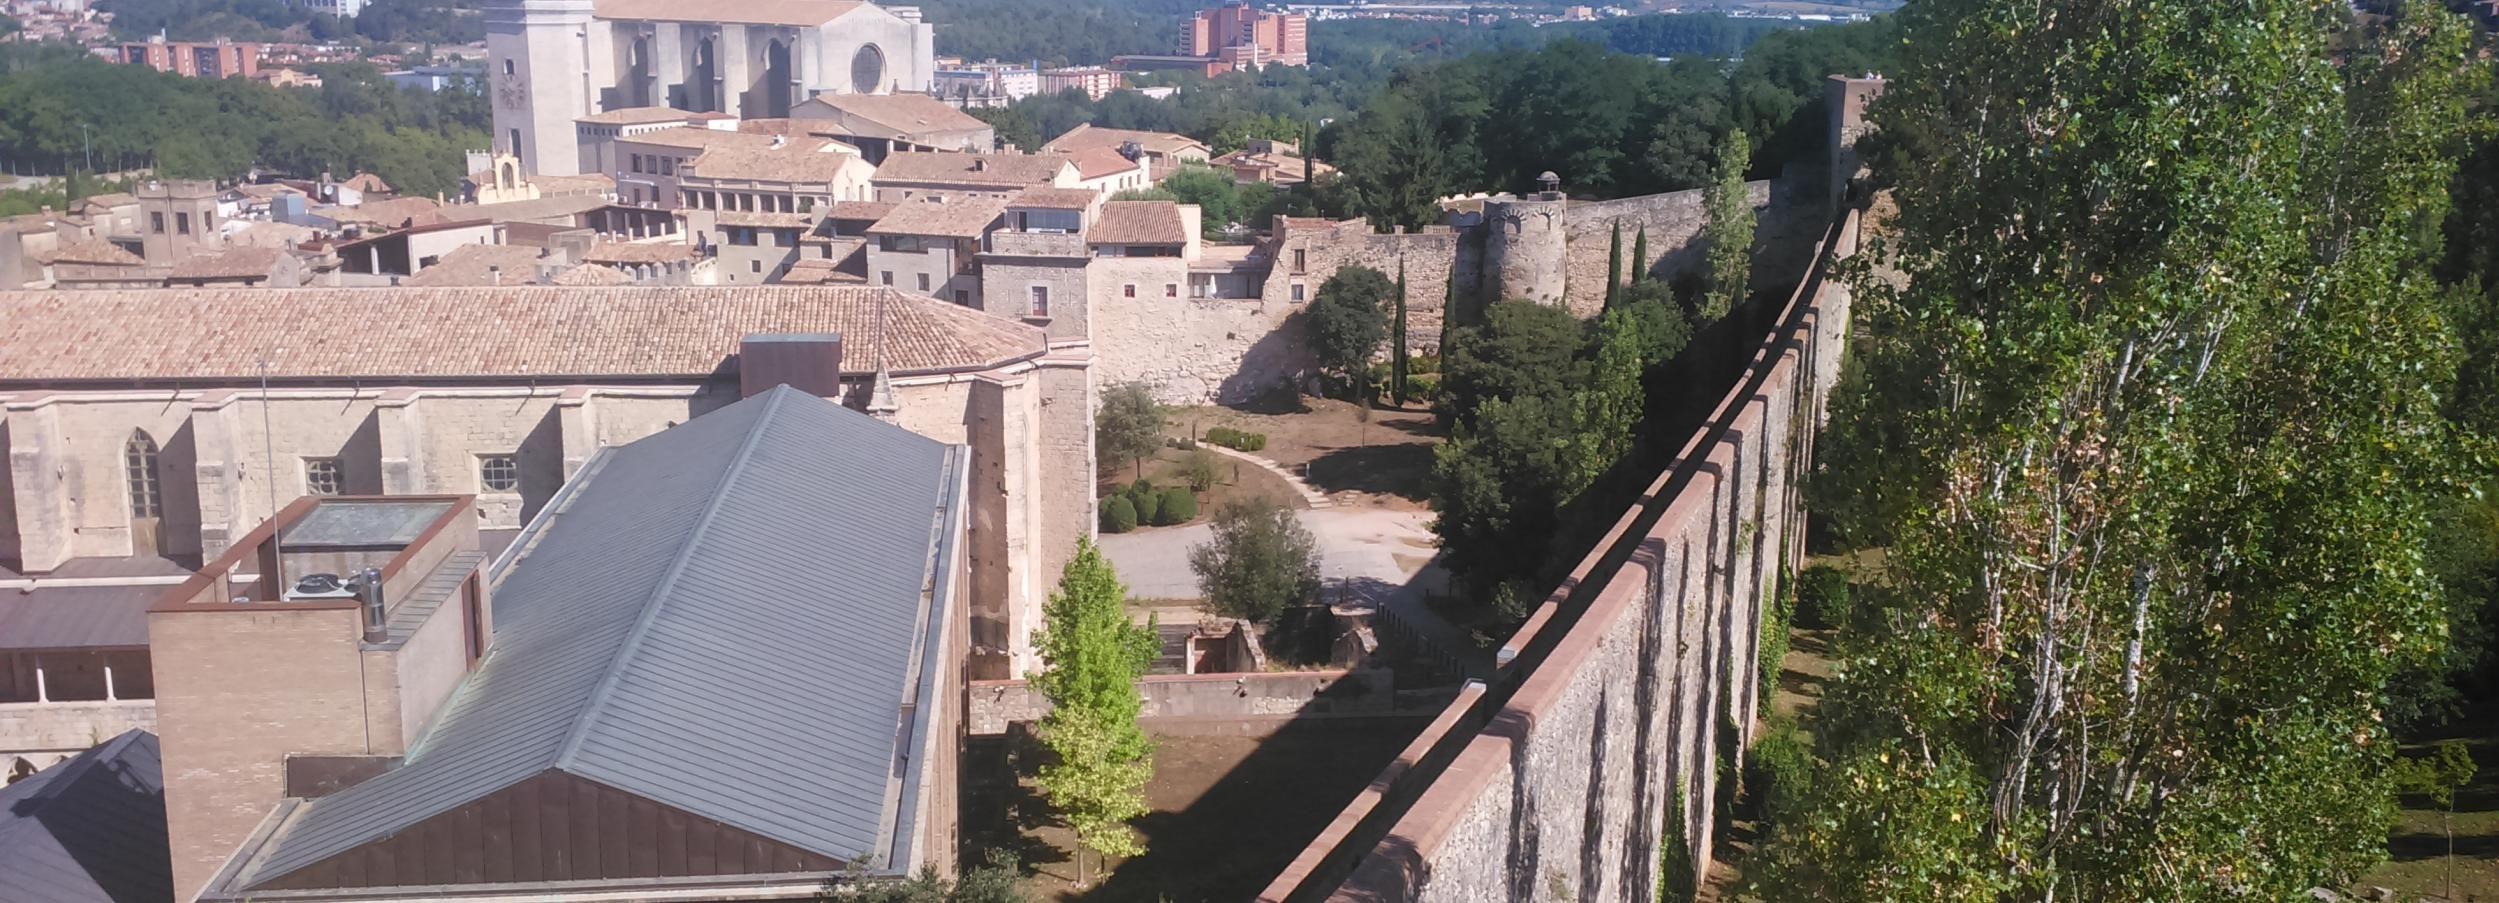 Girona: Small Group Jewish History Tour of Girona and Besalú